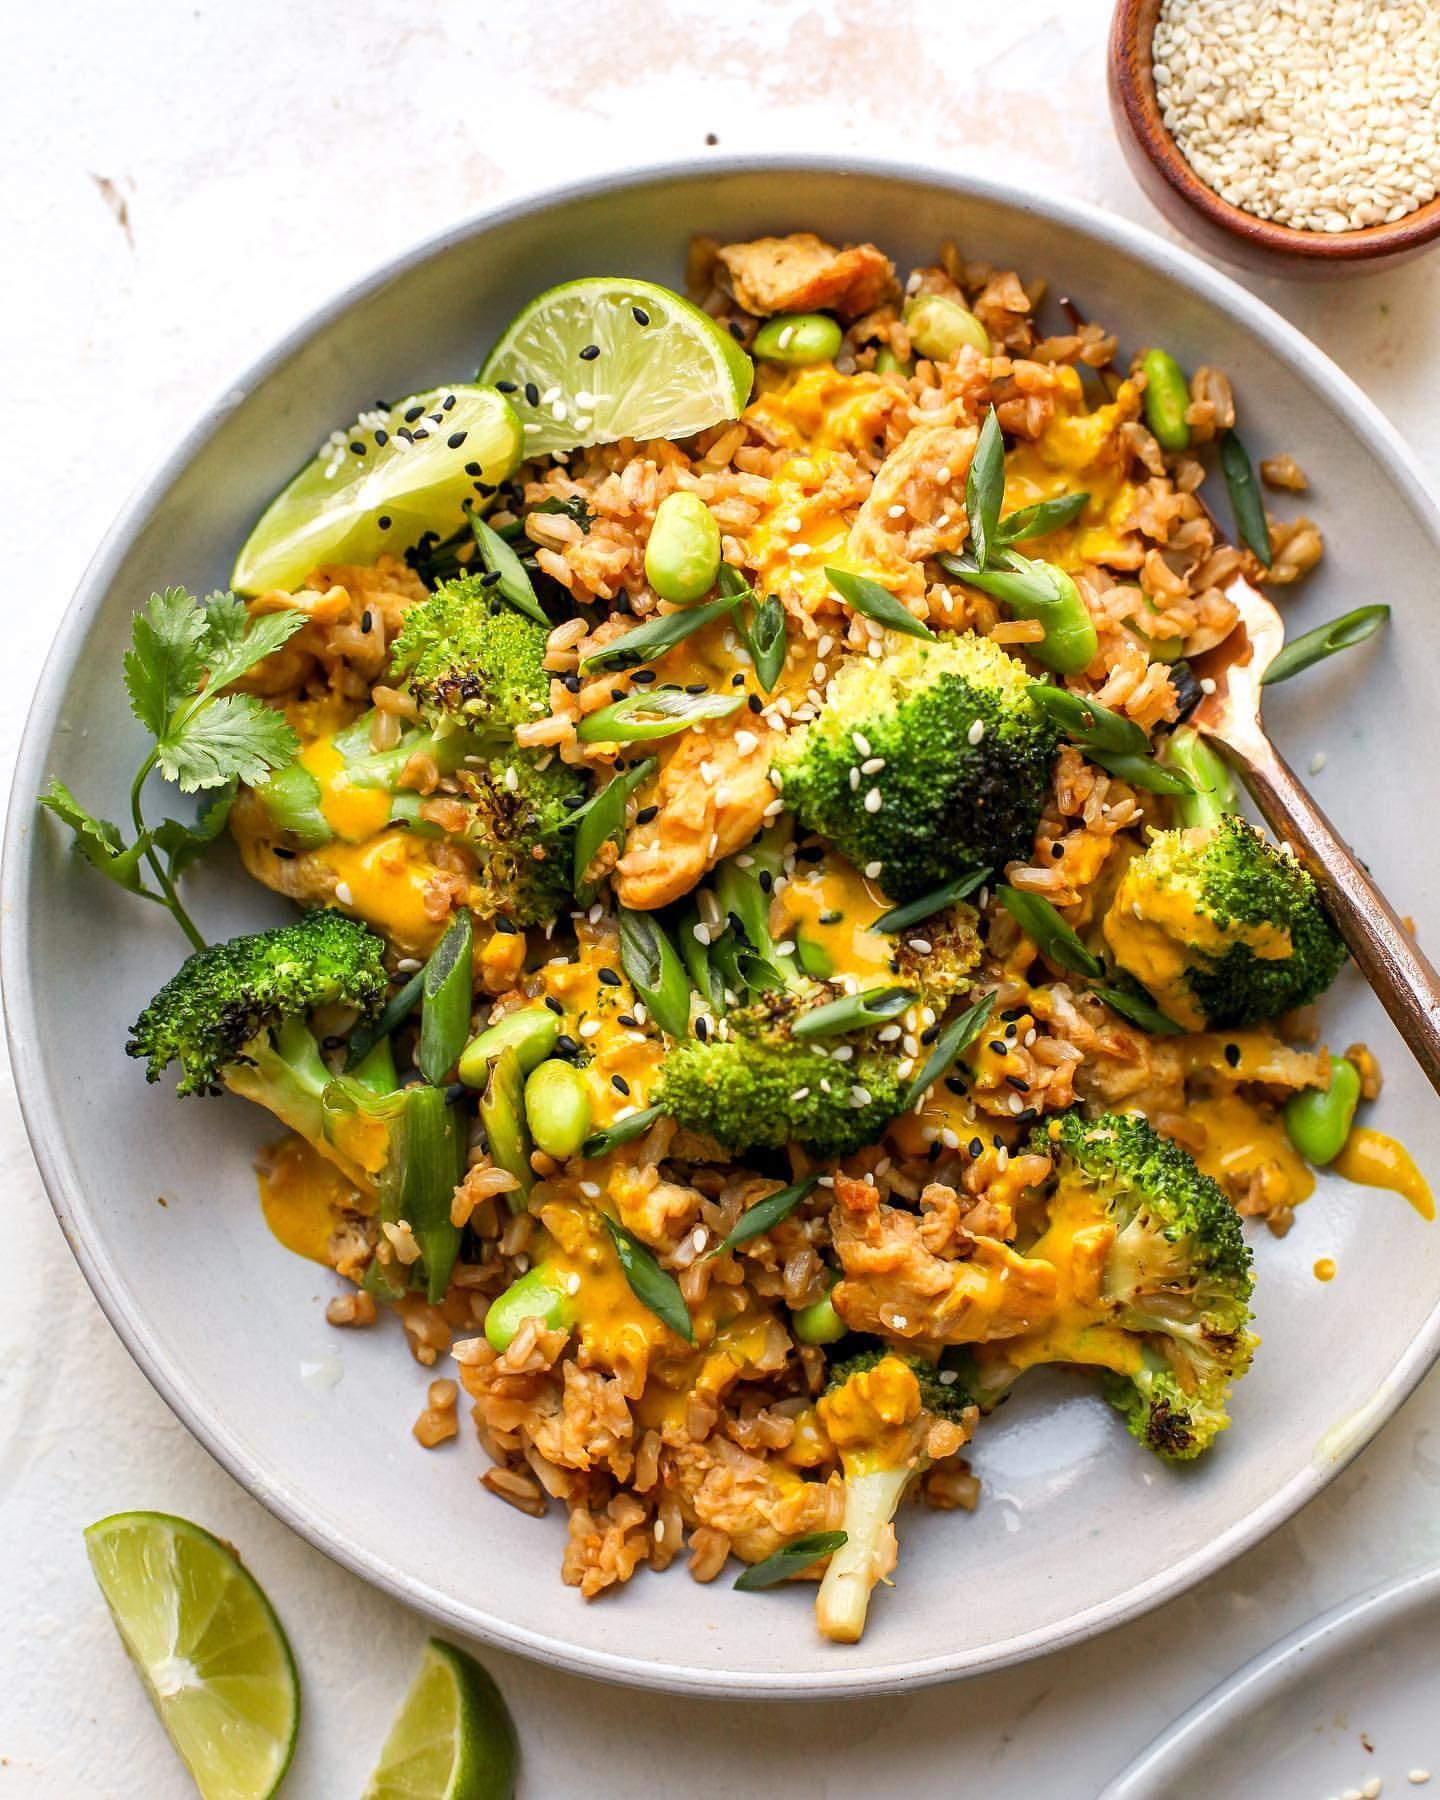 Fried Rice and Broccoli with Turmeric Tahini Sauce